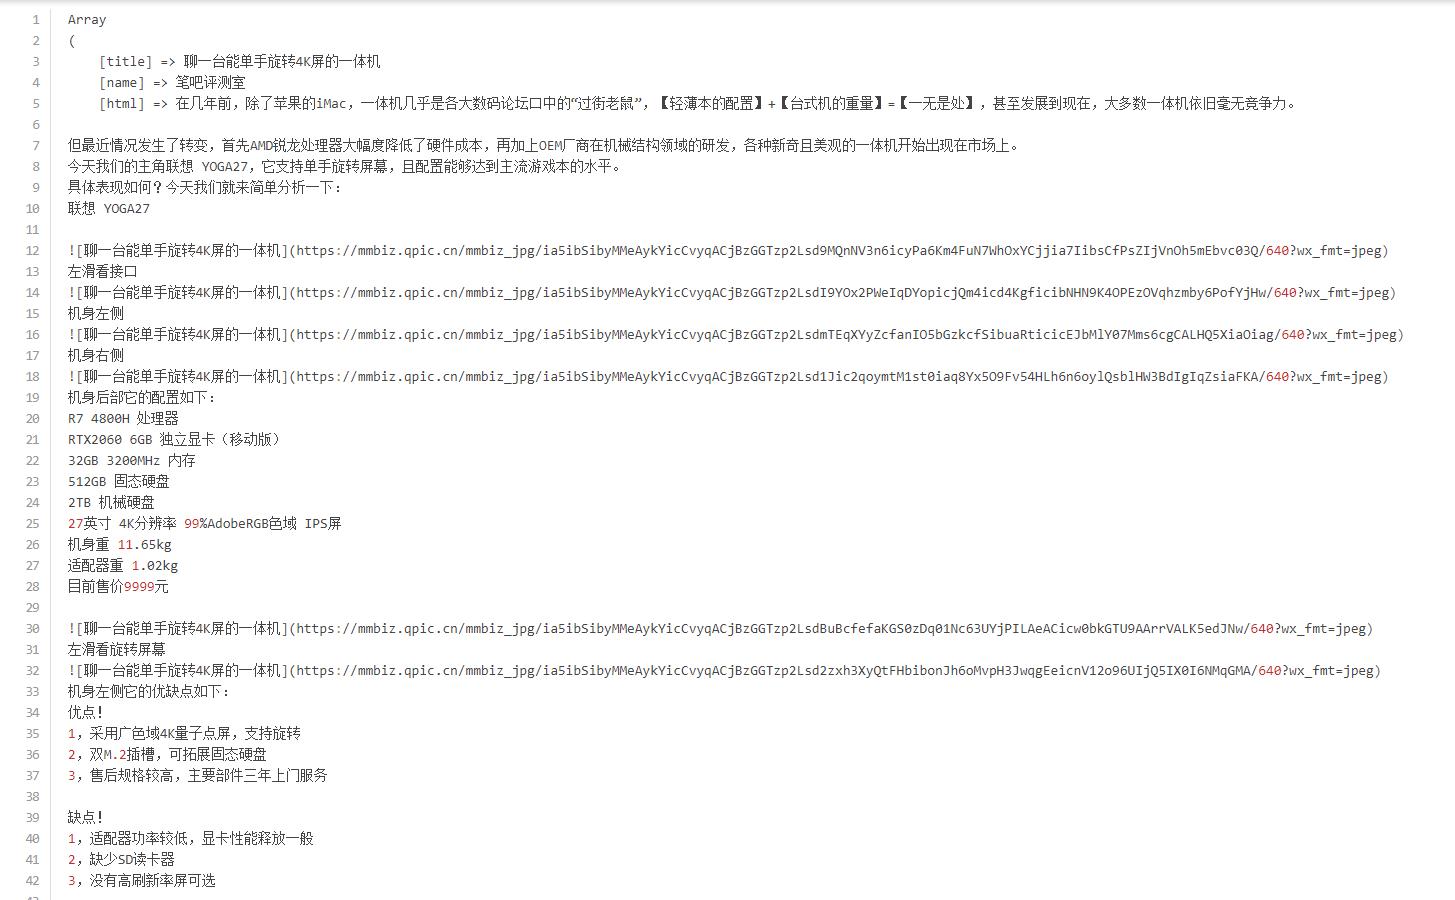 QueryListPHP框架采集微信公众号文章